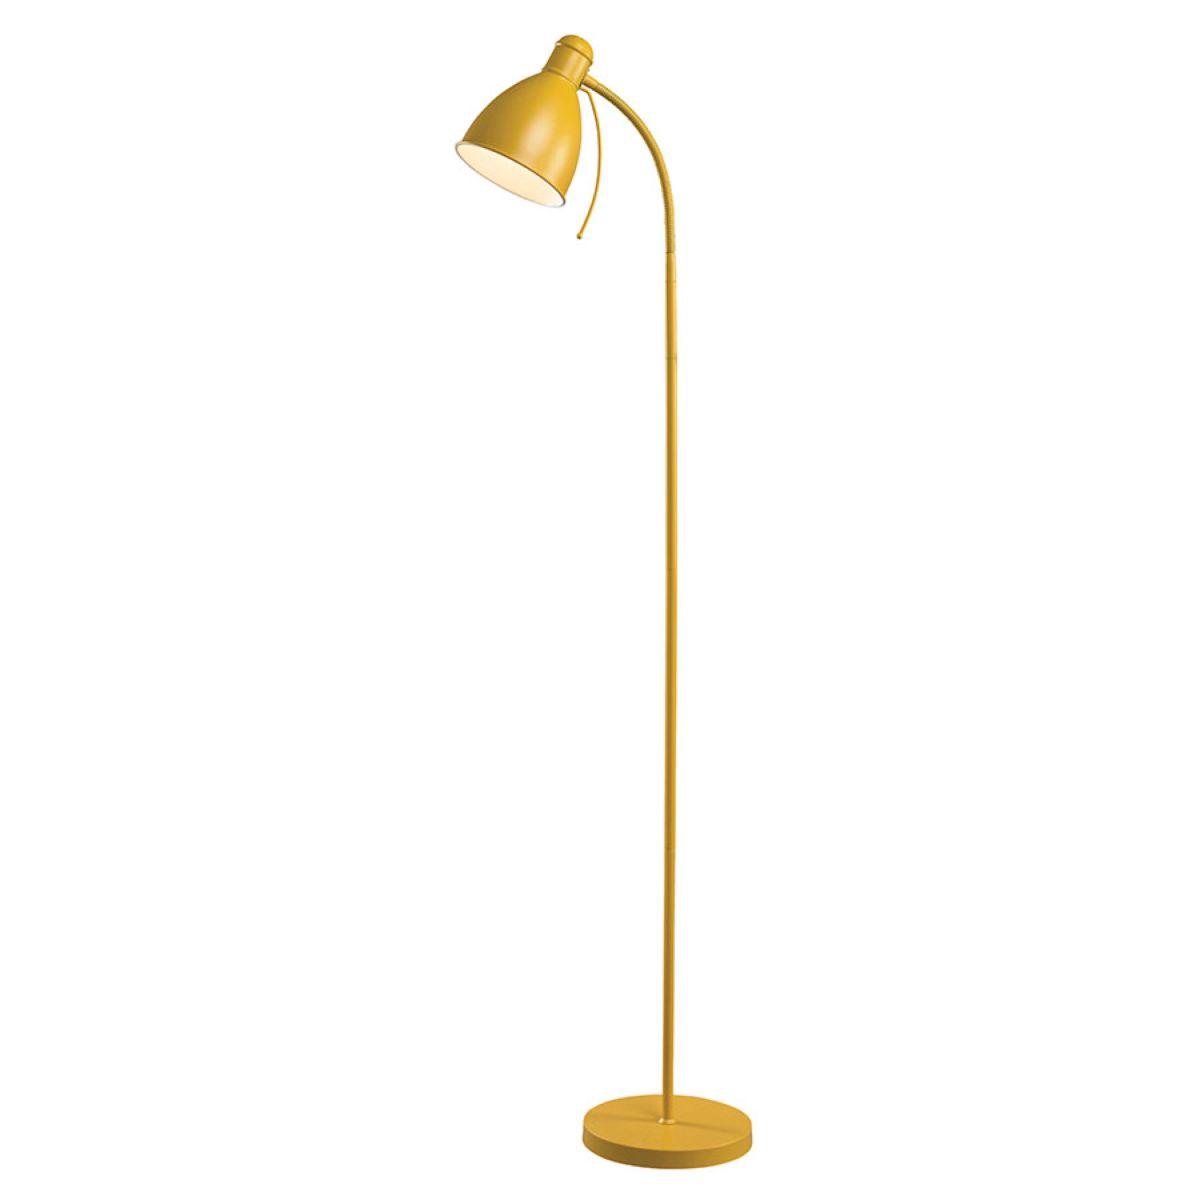 Village At Home Sven Floor Lamp - Ochre Yellow